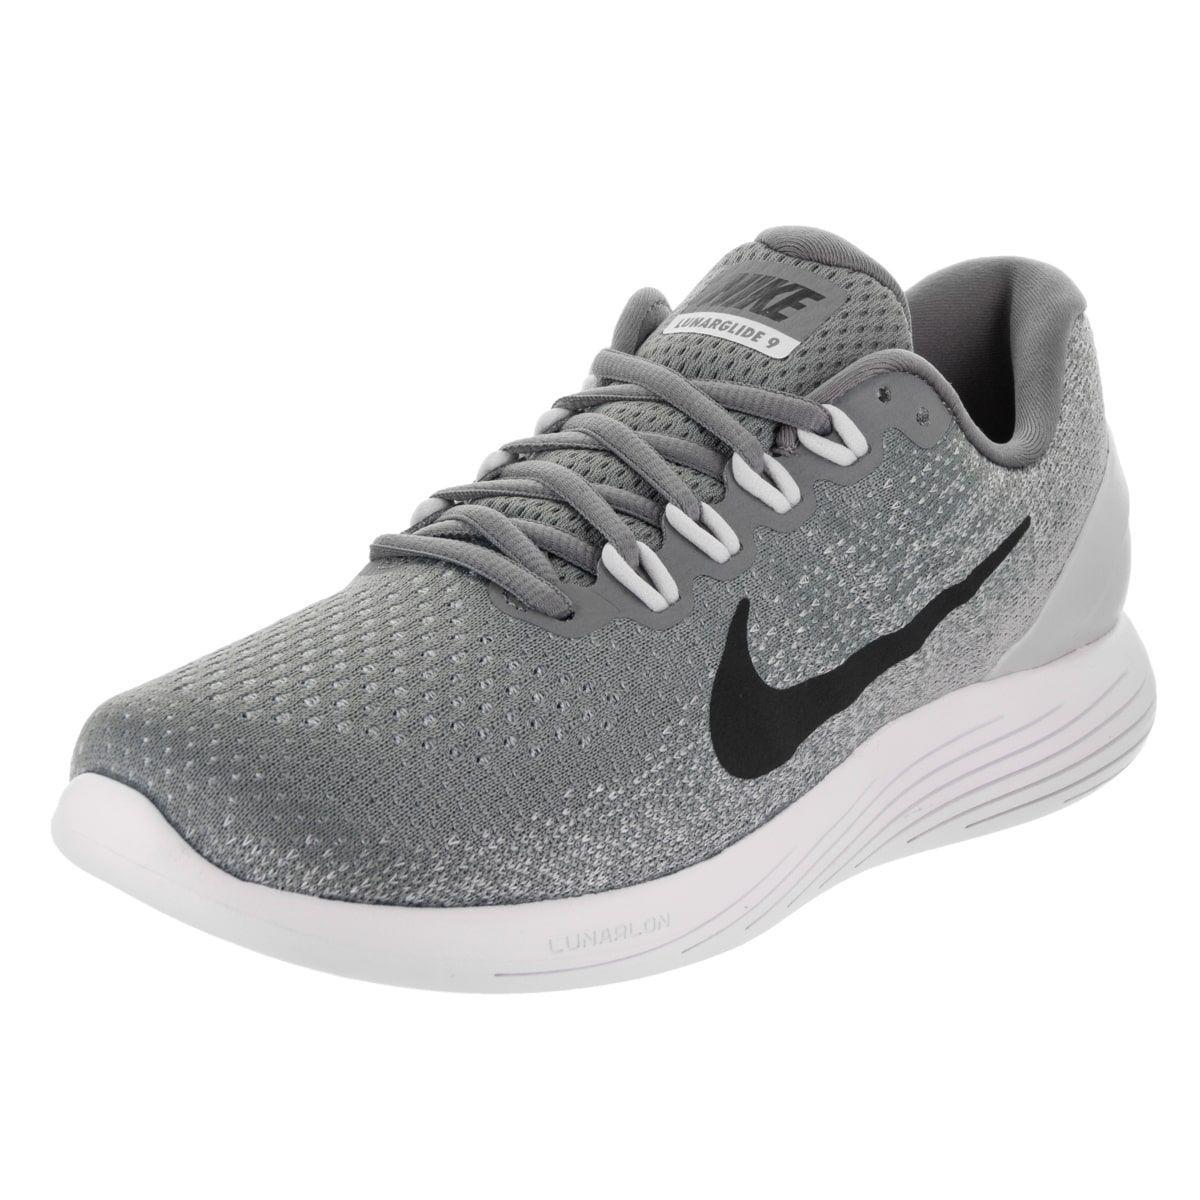 outlet store 2d811 40590 Nike Men's Lunarglide 9 Running Shoe | fitness | Nike ...